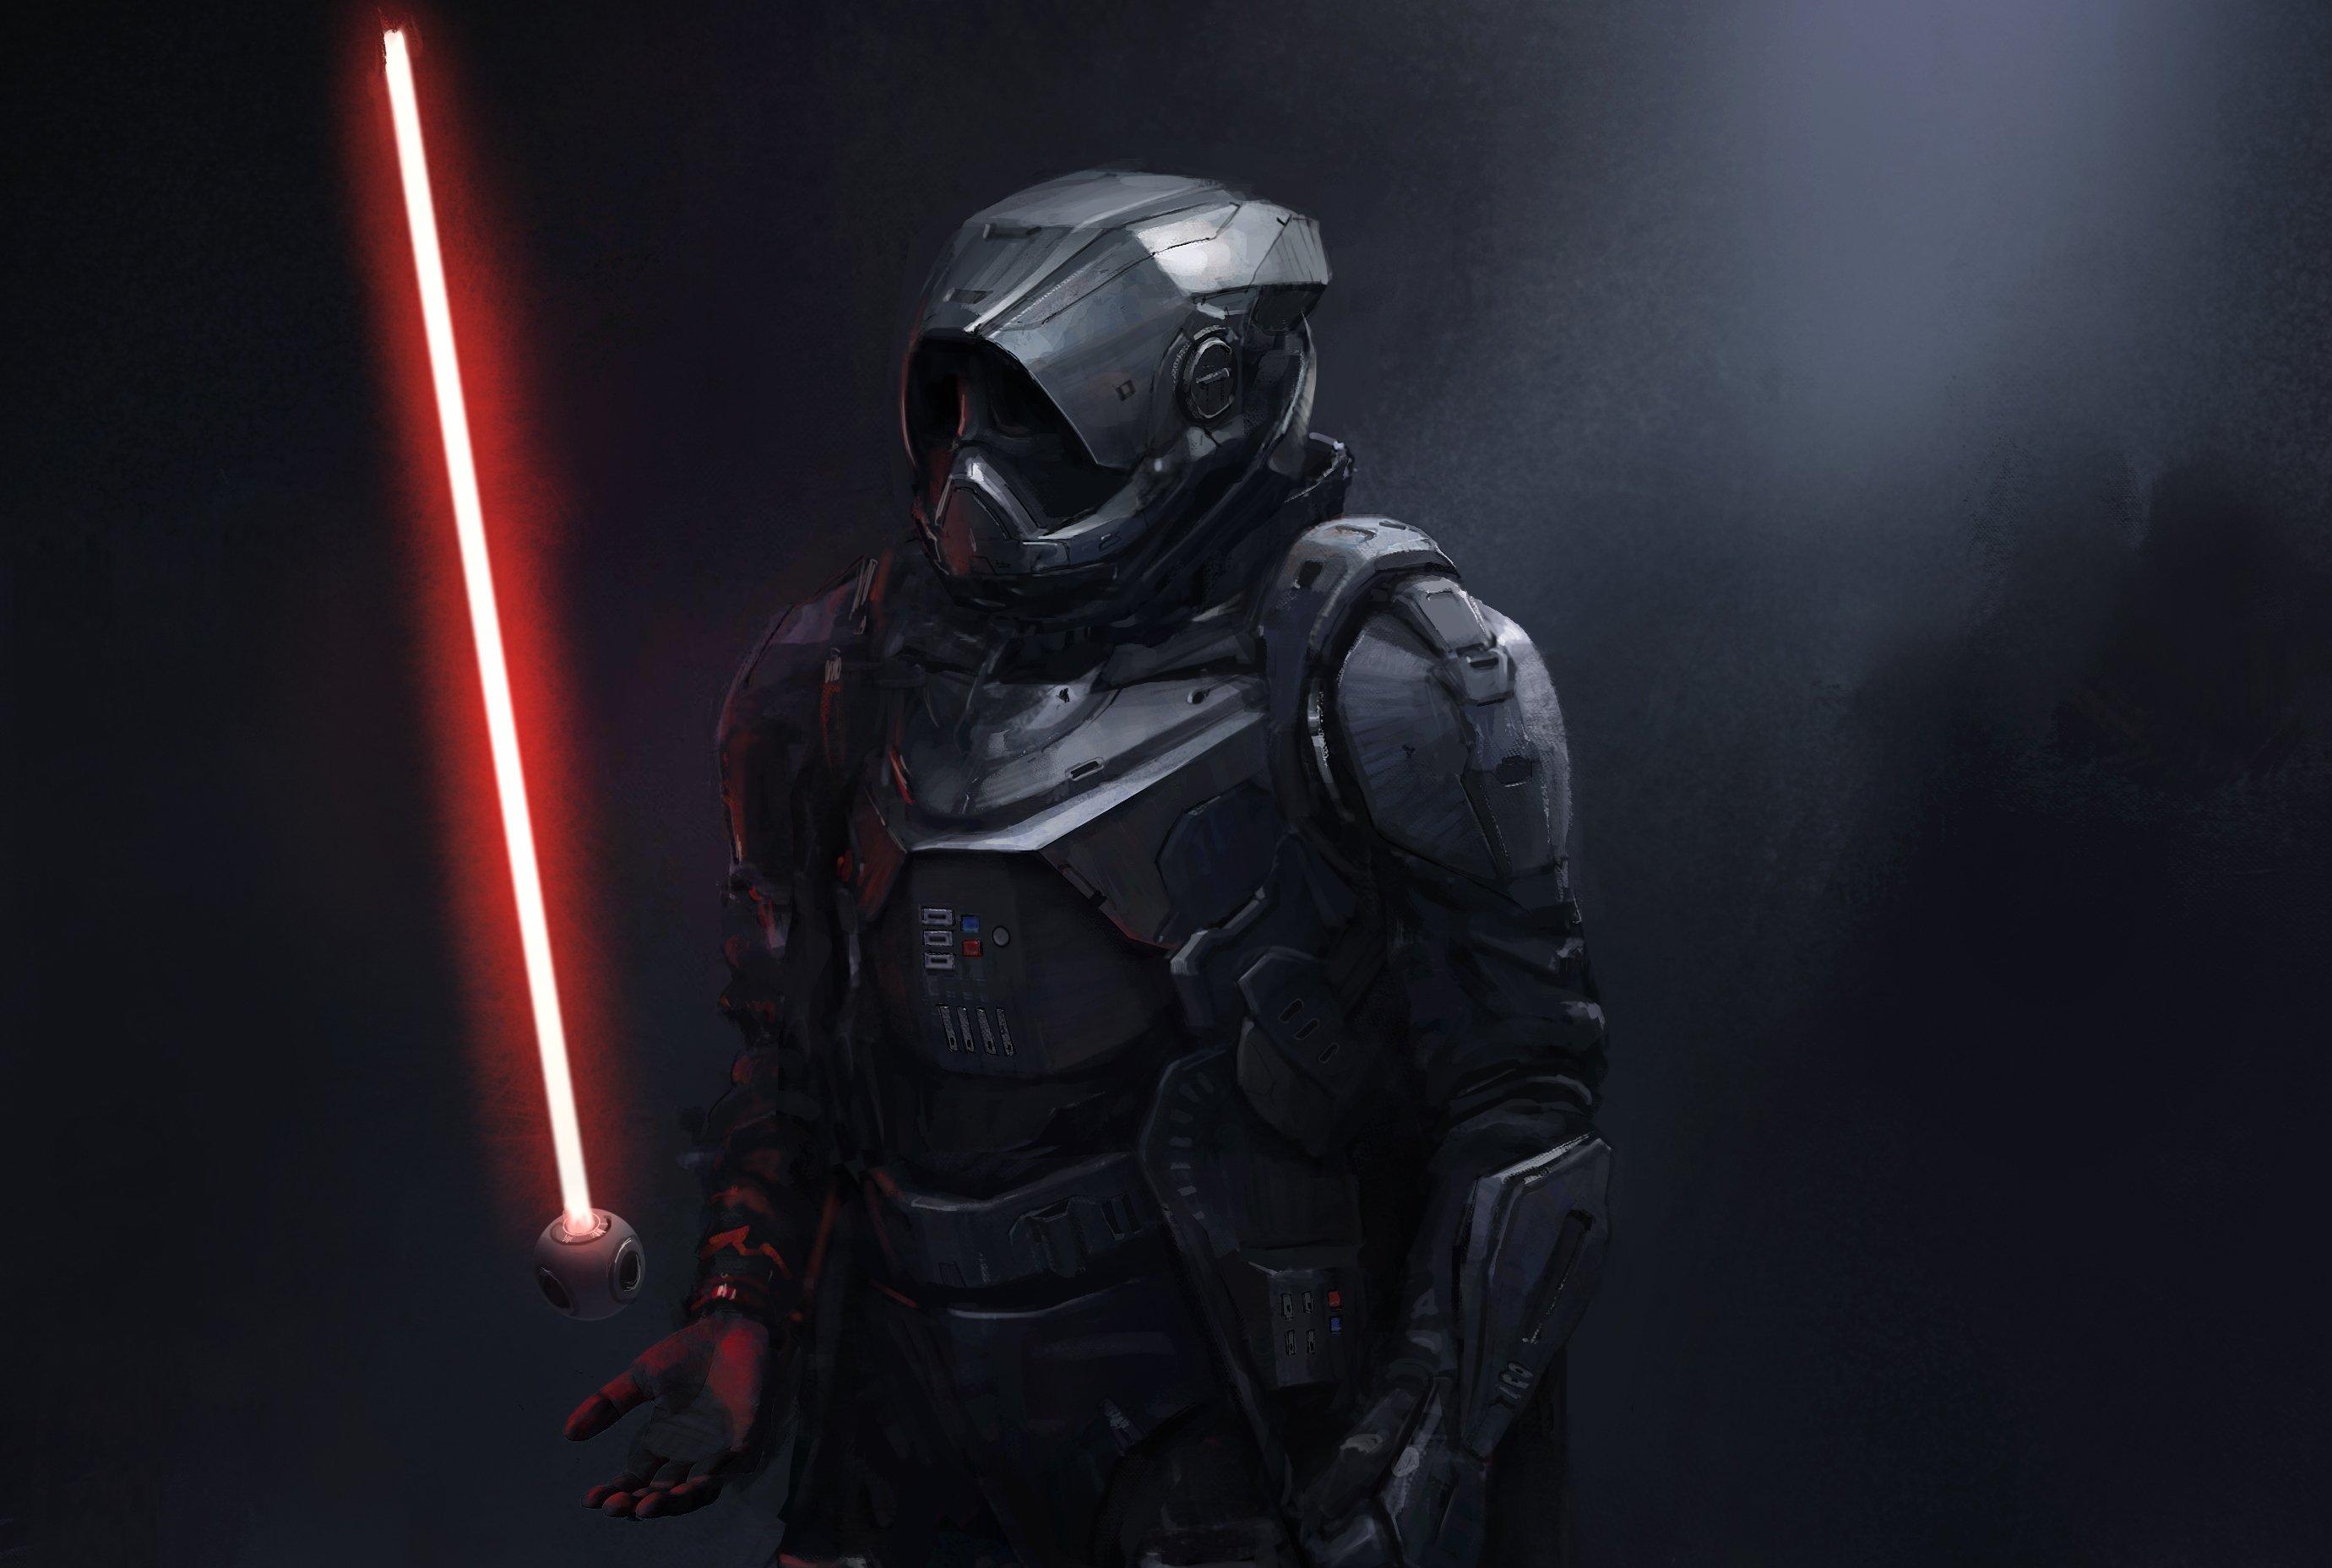 Wallpaper 2761x1857 Px Anakin Armor Artwork Darth Fantasy Fi Jedi Movies Sci Sith Skywalker Star Sword Vader Warrior Wars 2761x1857 Goodfon 1808035 Hd Wallpapers Wallhere